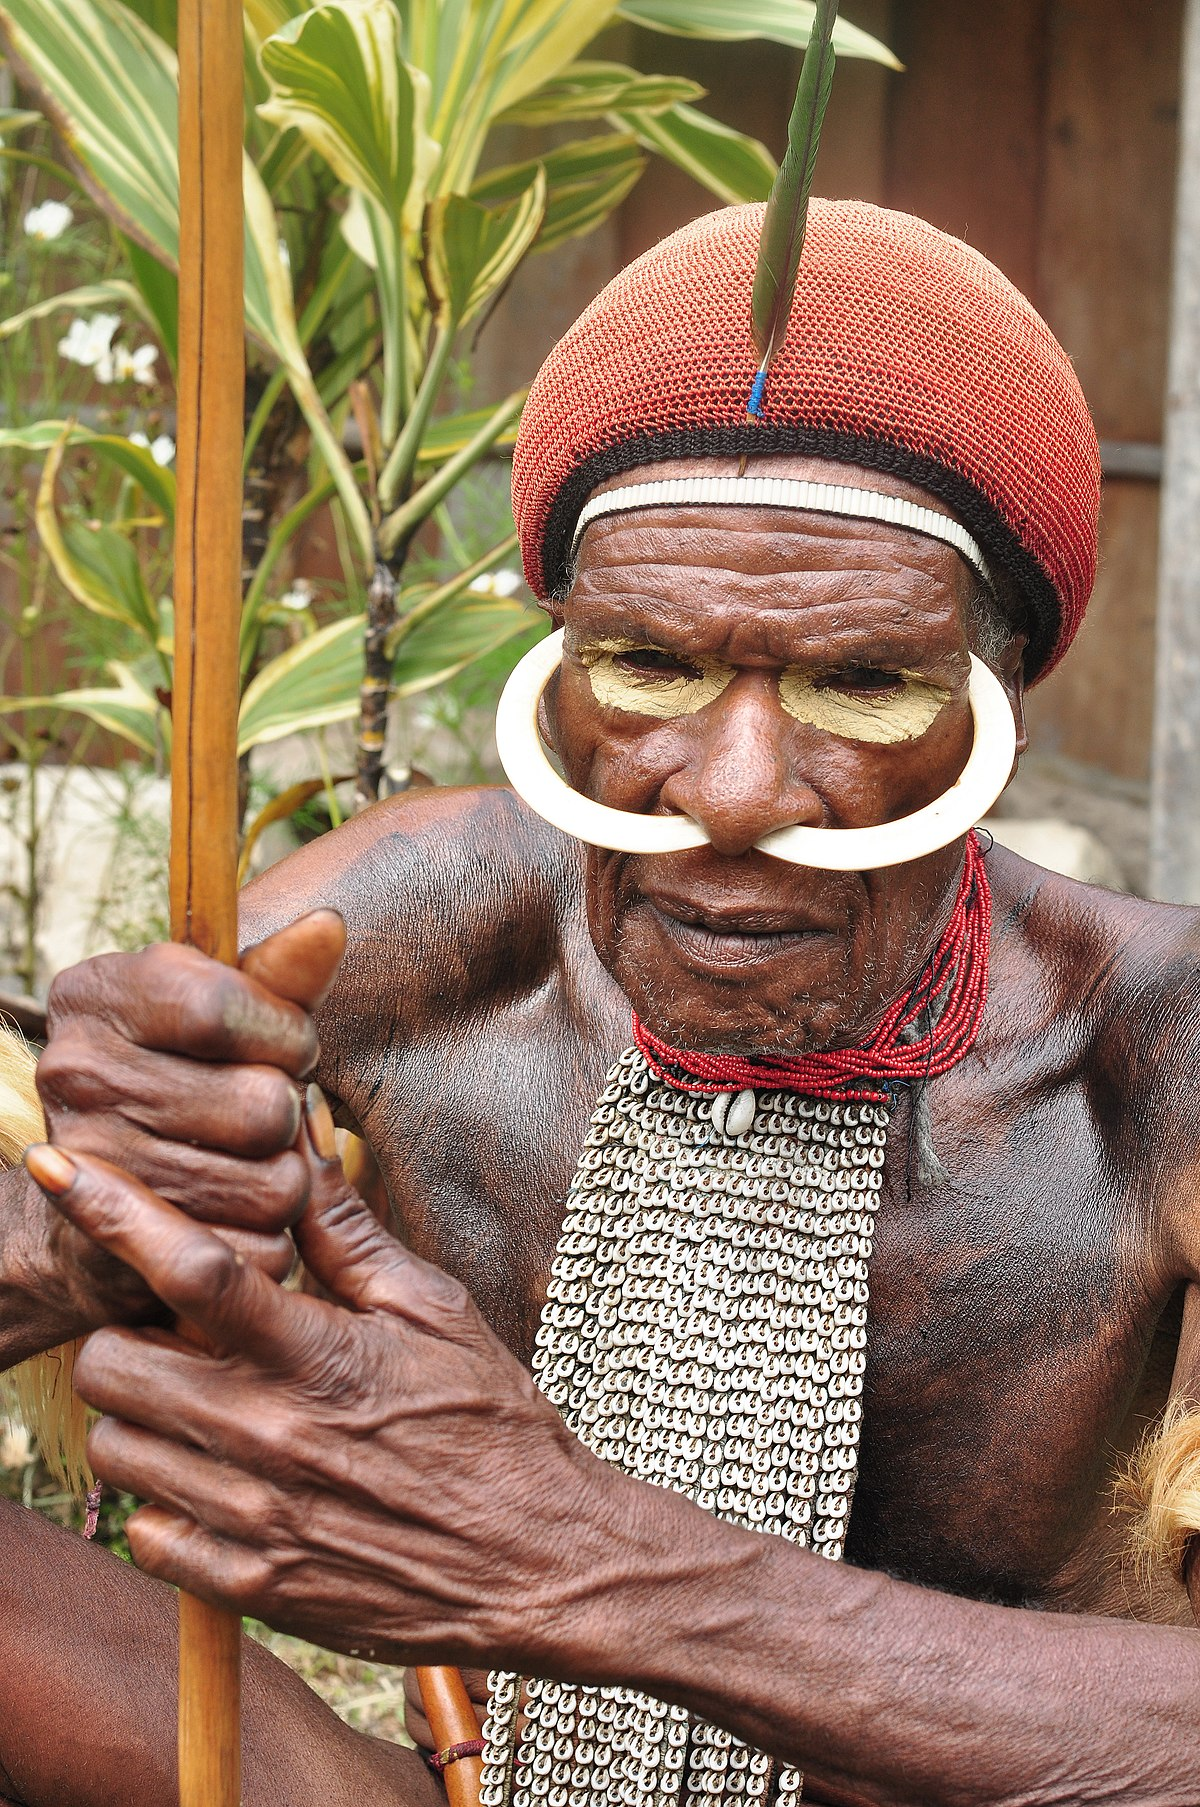 Apa Nama Pakaian Adat Papua